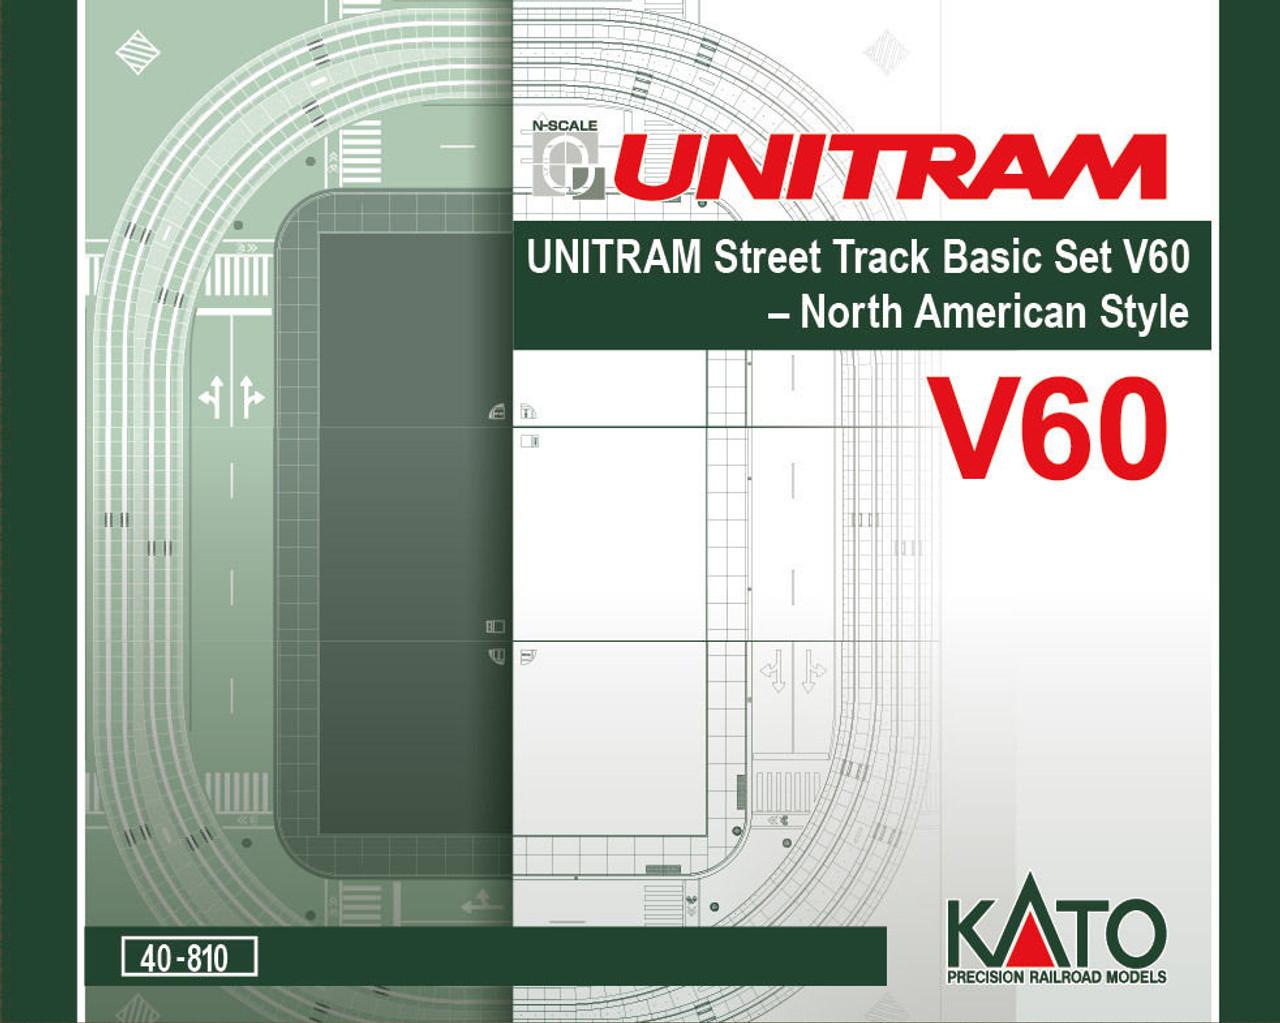 oval diagram models wiring diagramoval diagram models wiring diagram tutorial kato n scale v60 unitram north [ 1280 x 1023 Pixel ]